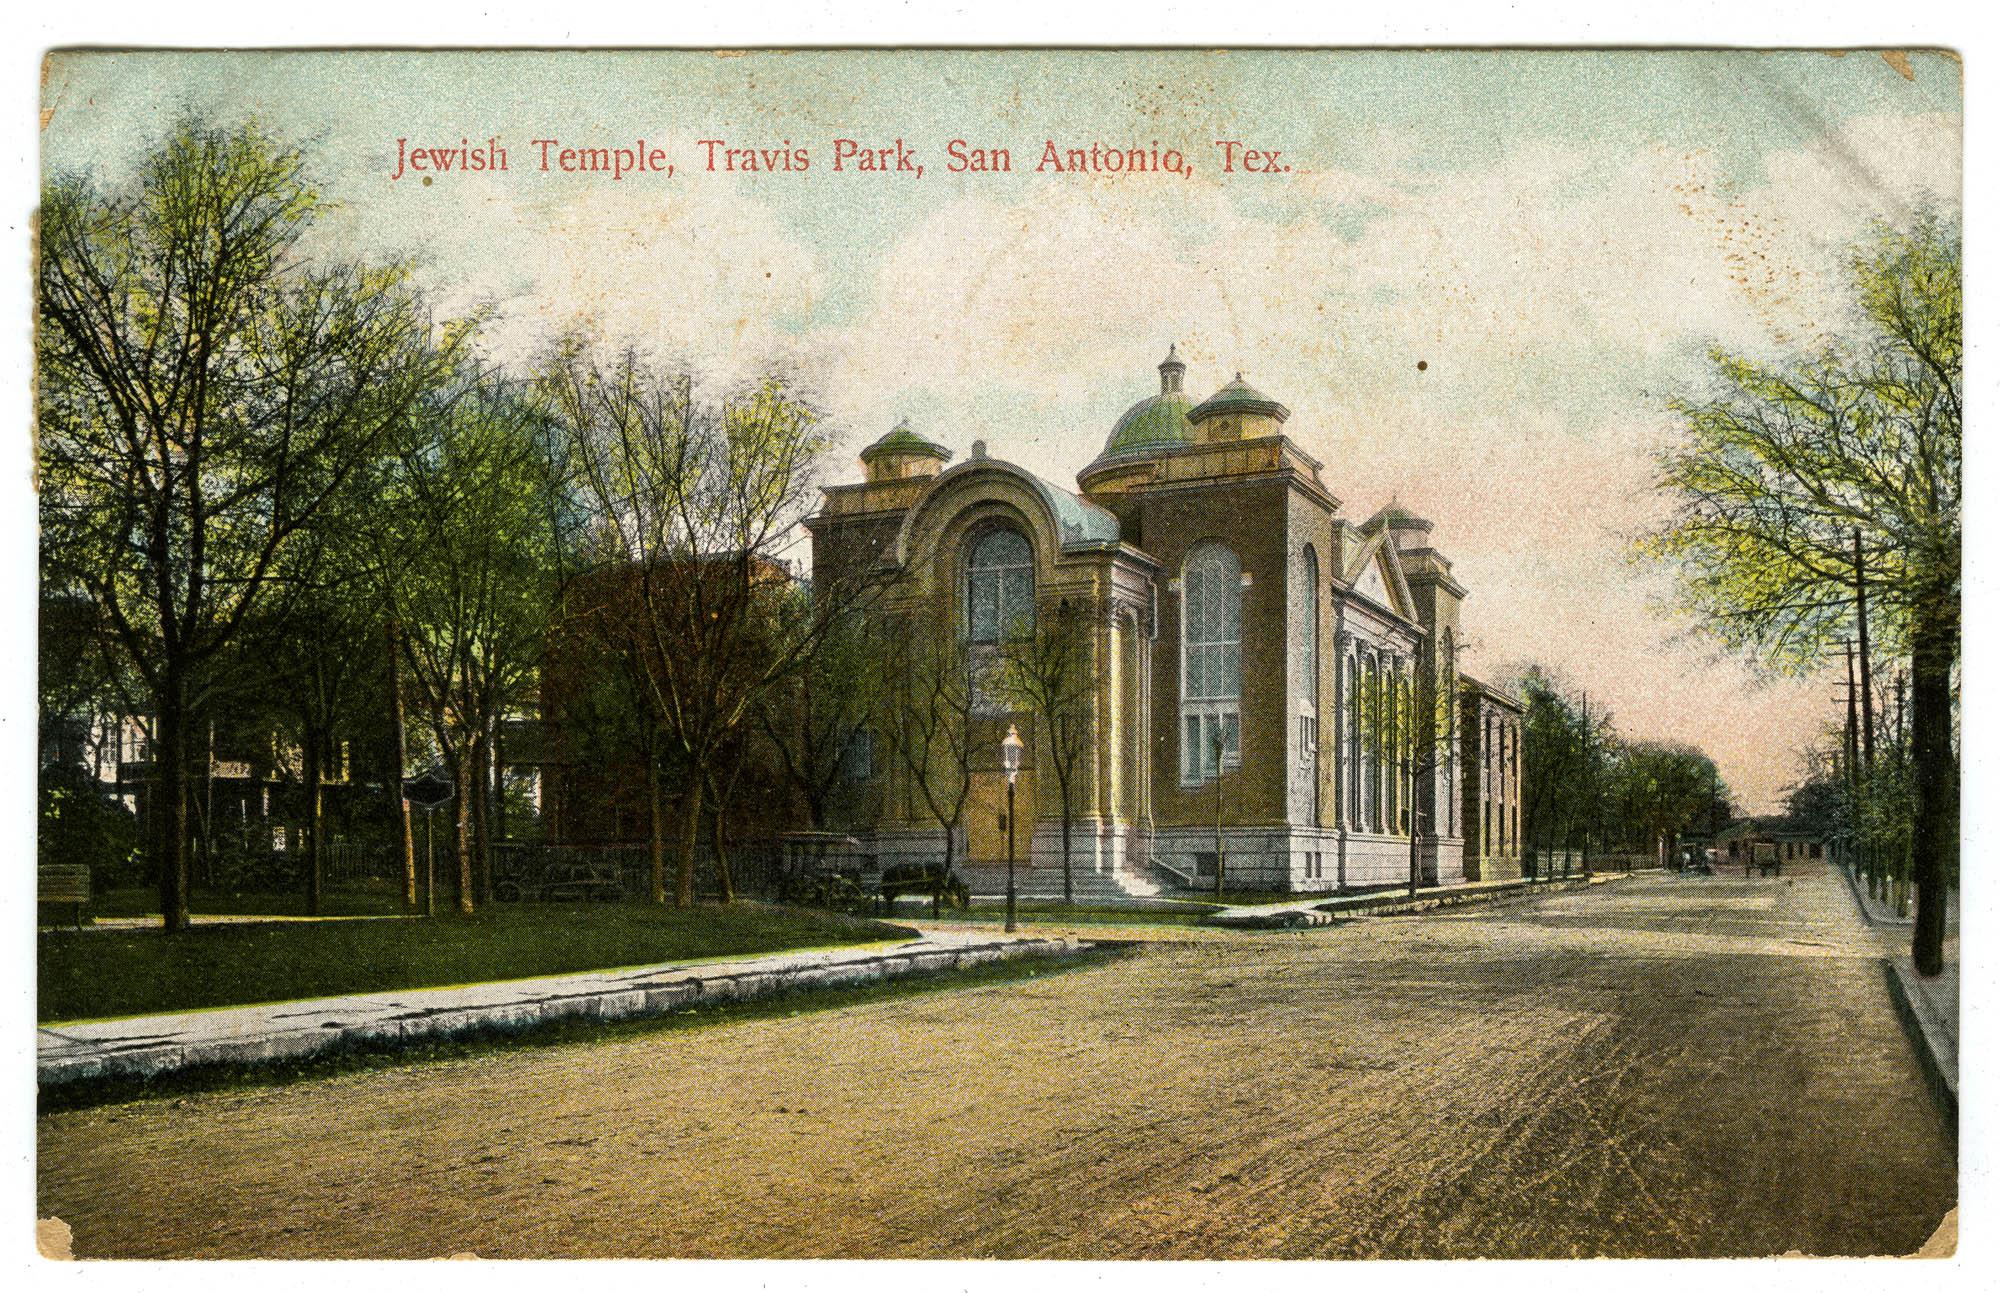 Jewish Temple, Travis Park, San Antonio, Tex.